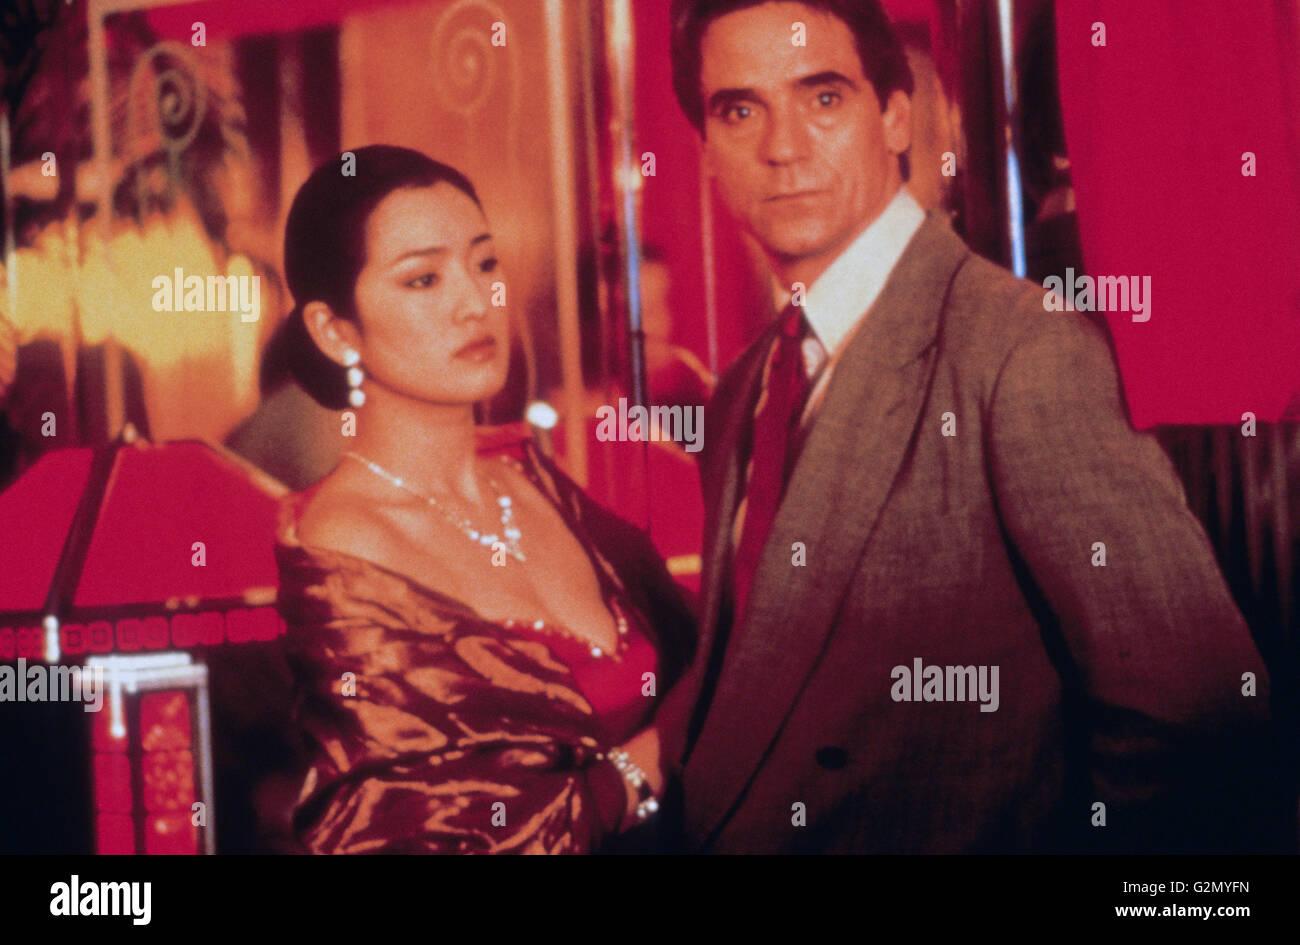 Caja china, Jeremy Irons, Gong Li,1997 Imagen De Stock